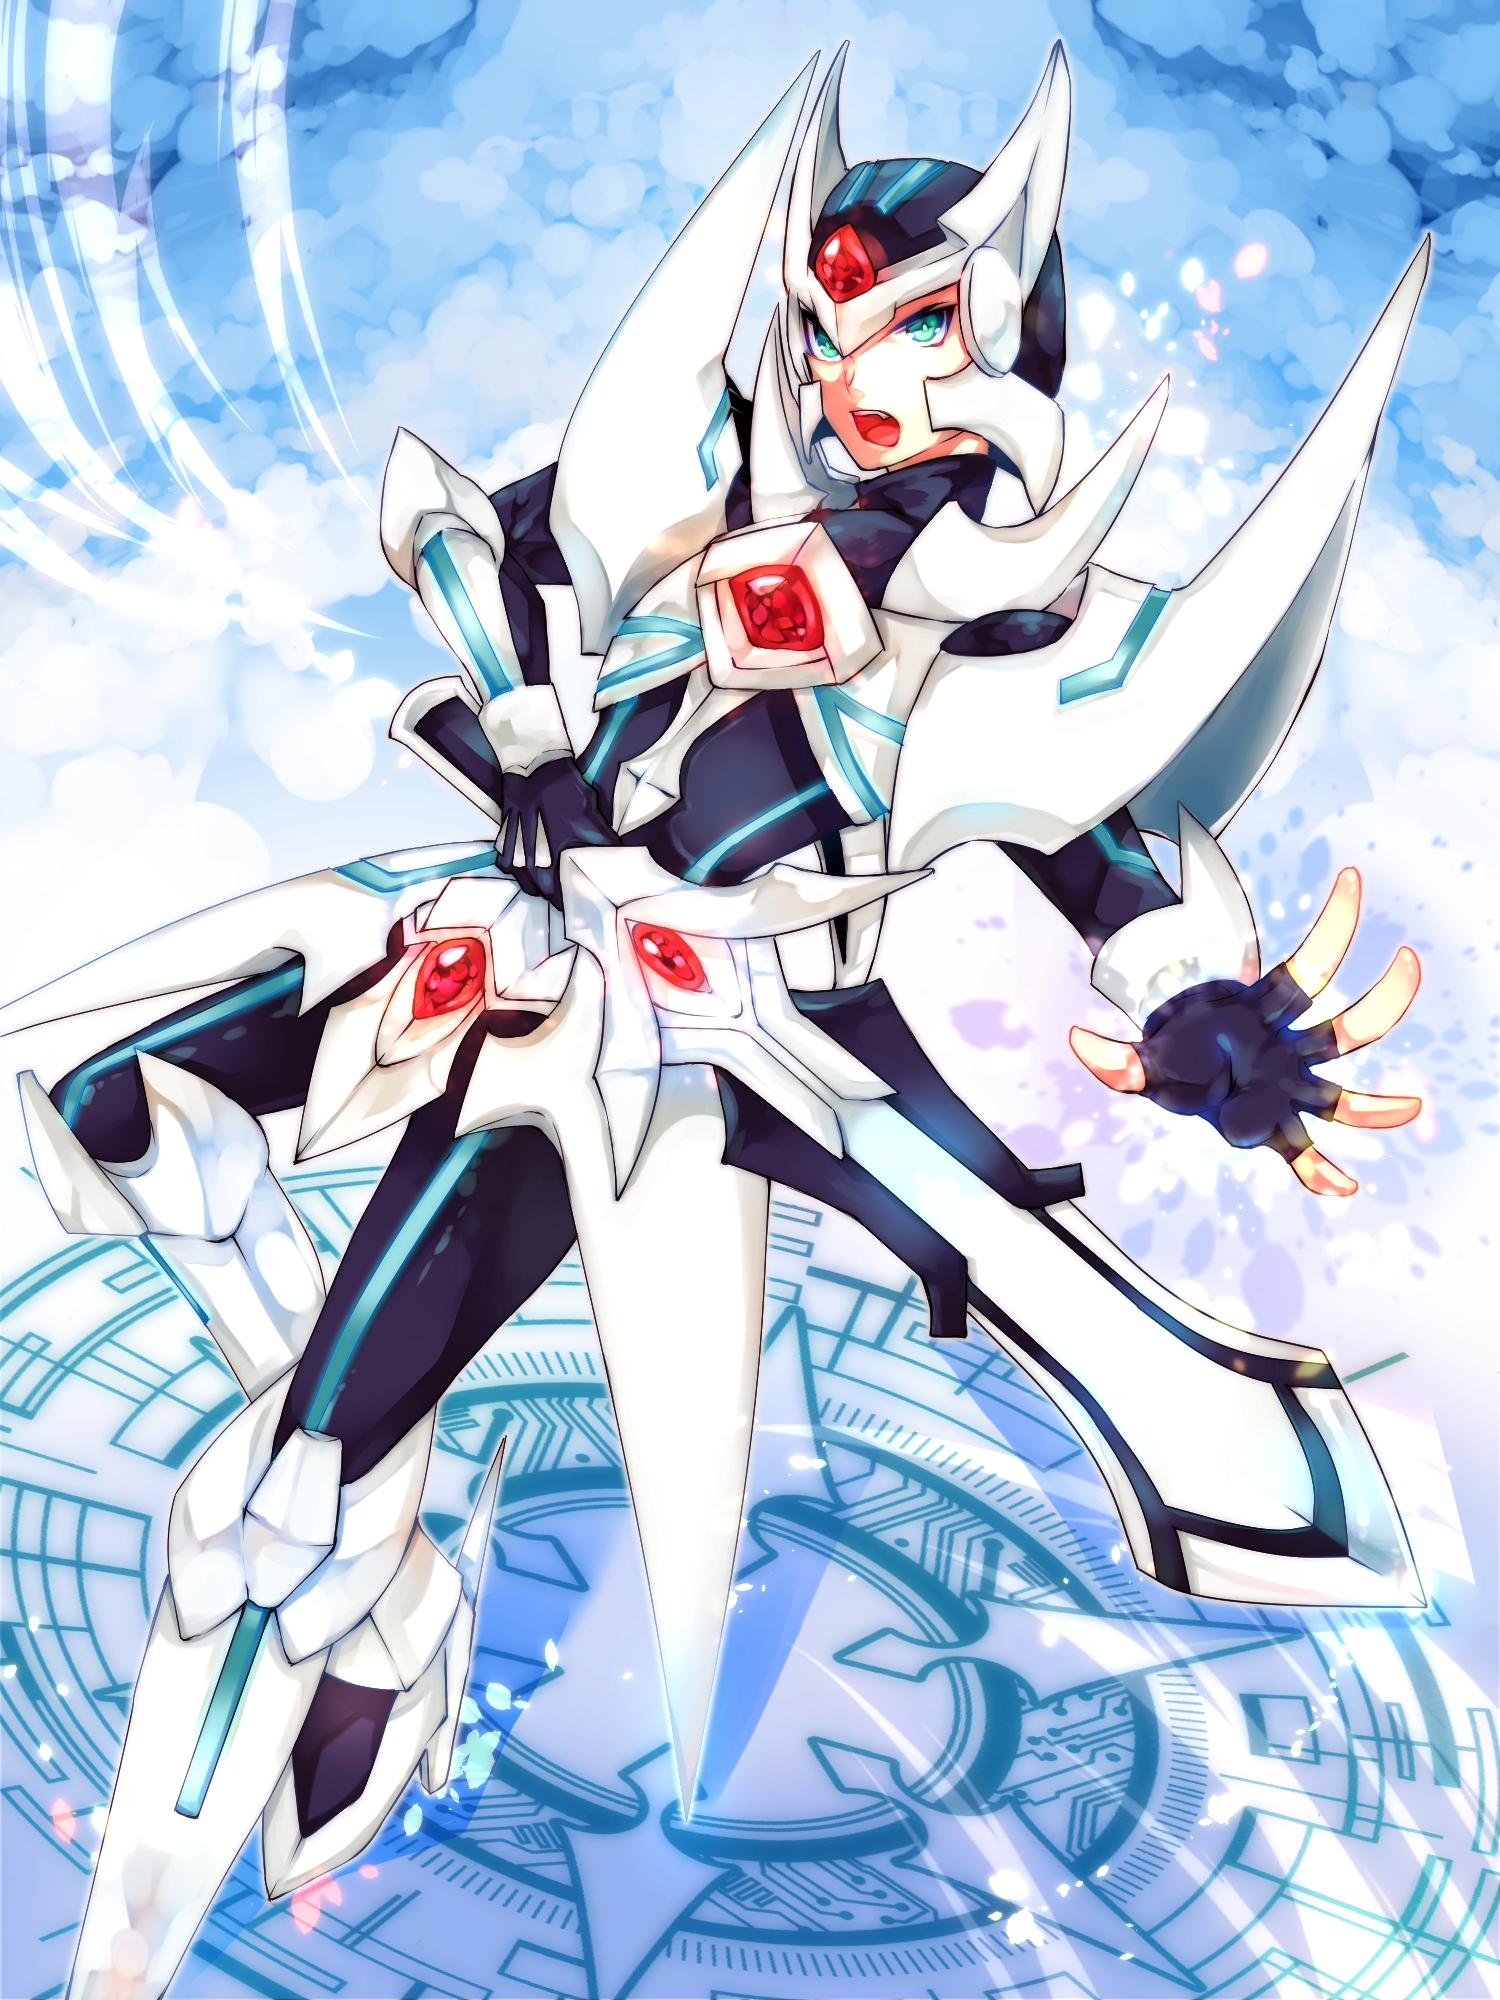 Blaster Blade/#1352104 - Zerochan